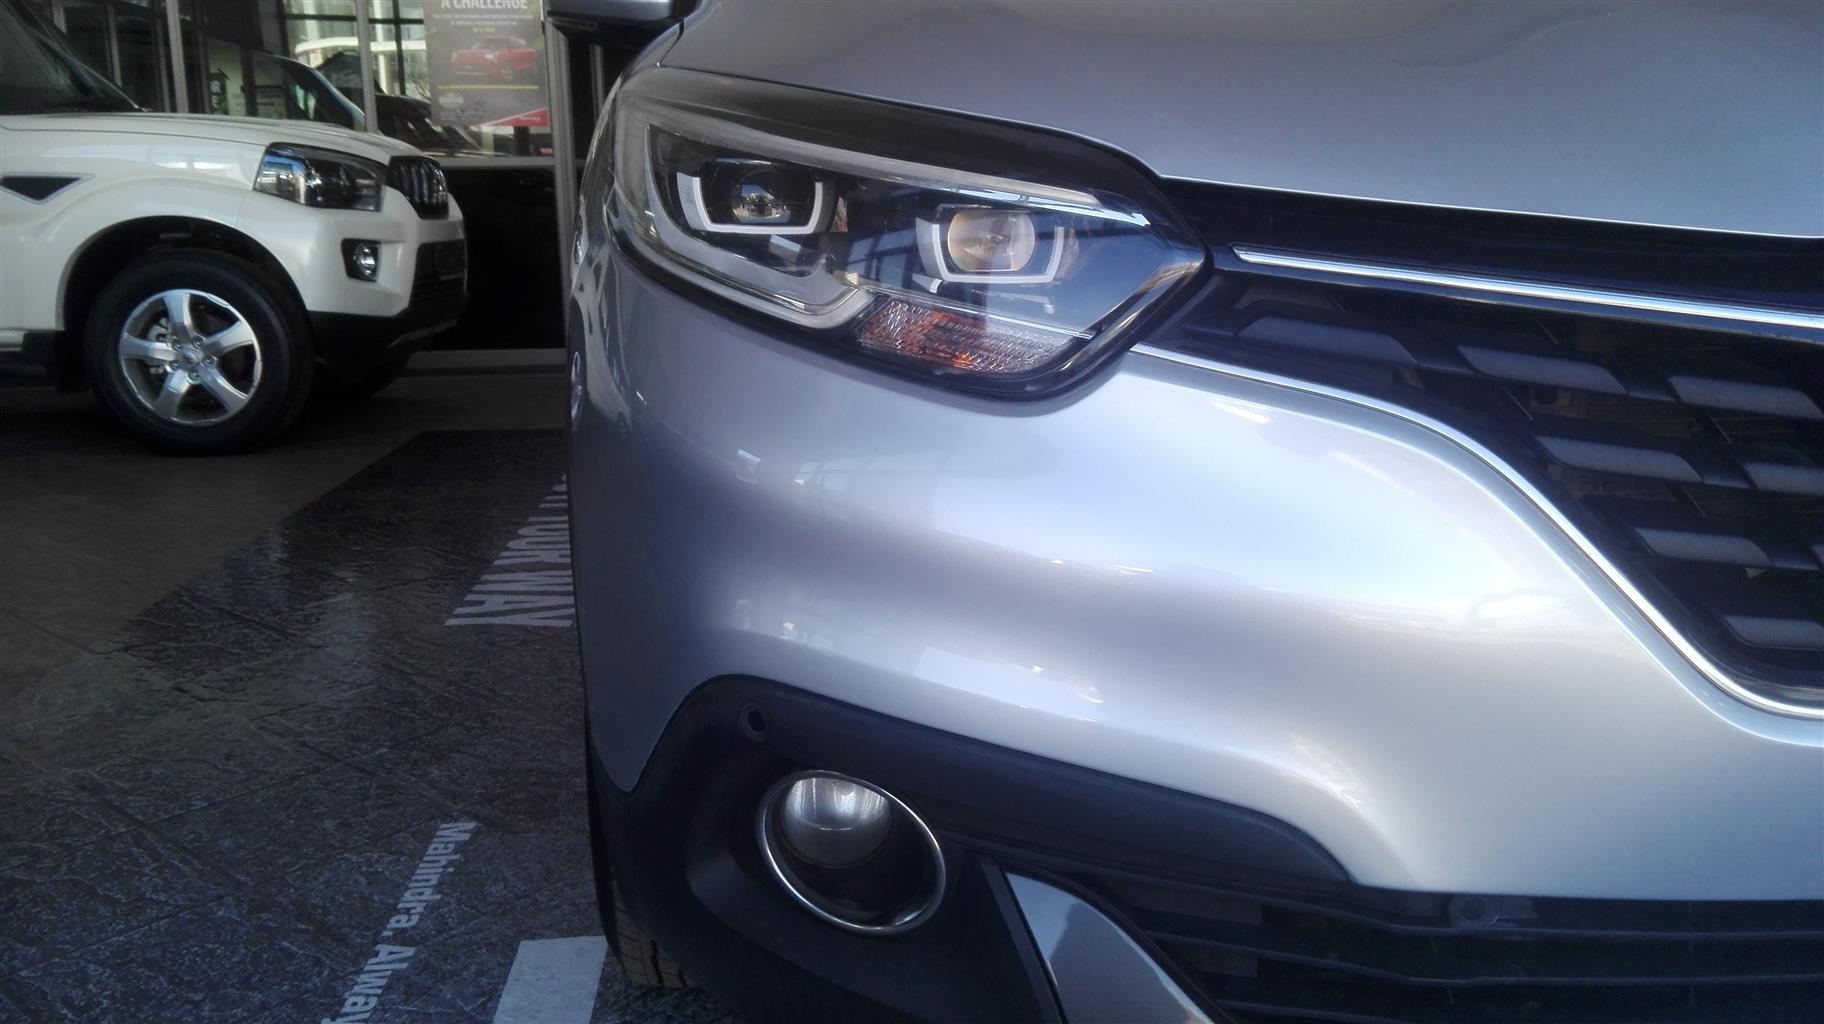 2017 Renault Kadjar 96kW dCi Dynamique 4WD